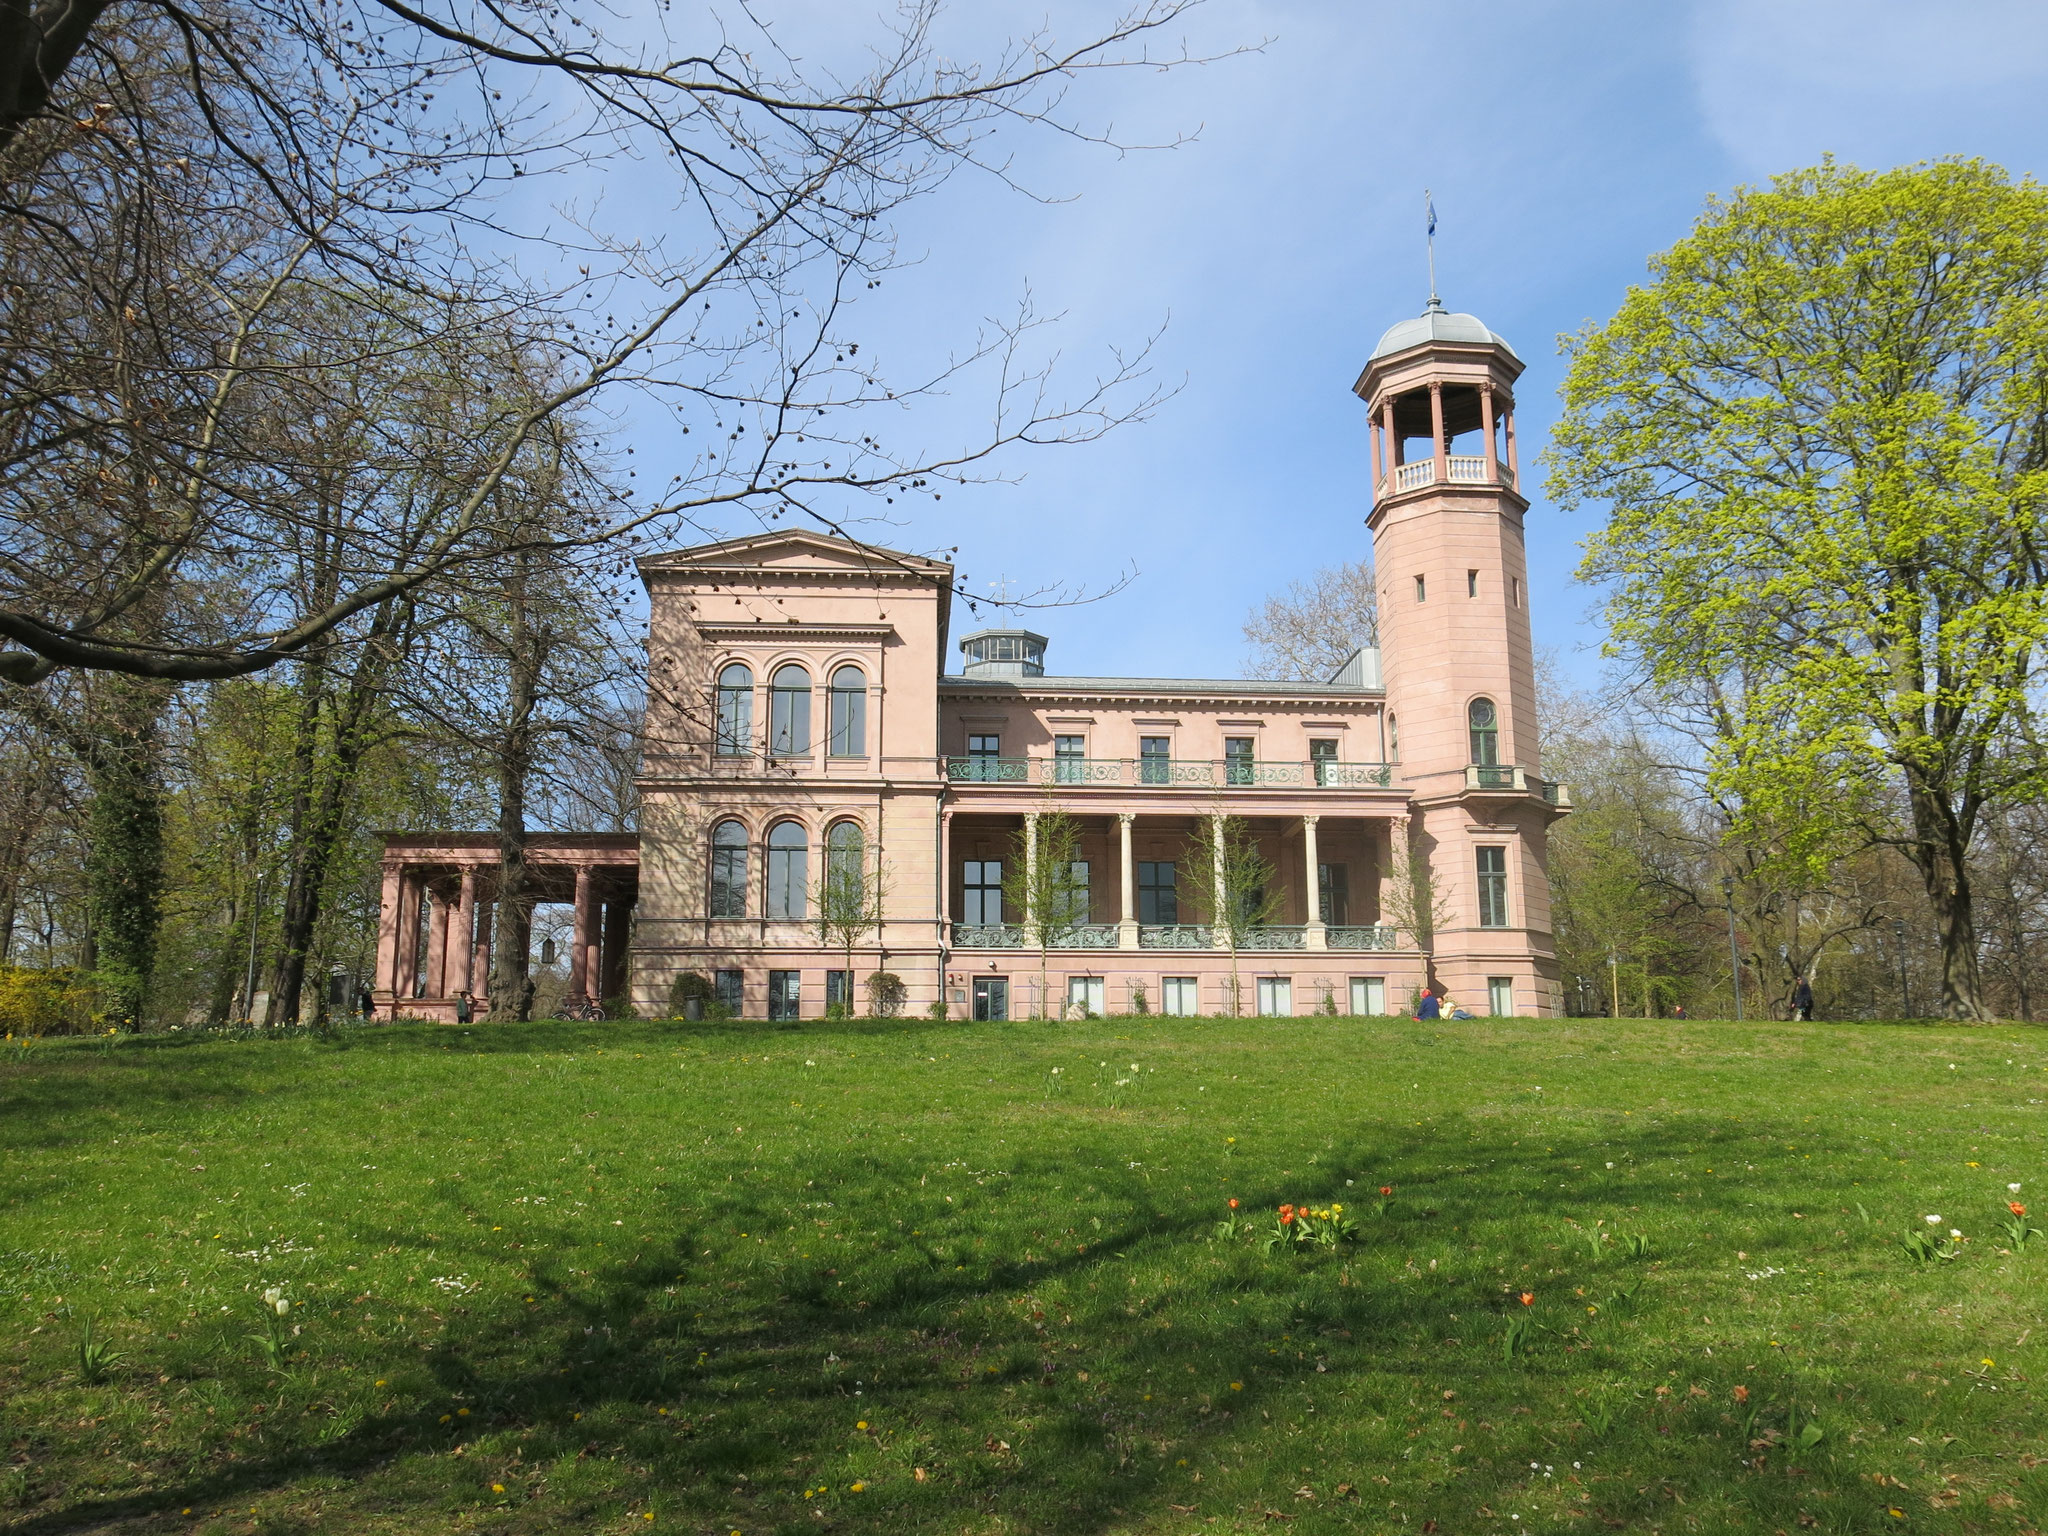 Sa, 18.07., 14.00-18.00 Uhr: Foto-Shooting im Schloss Biesdorf